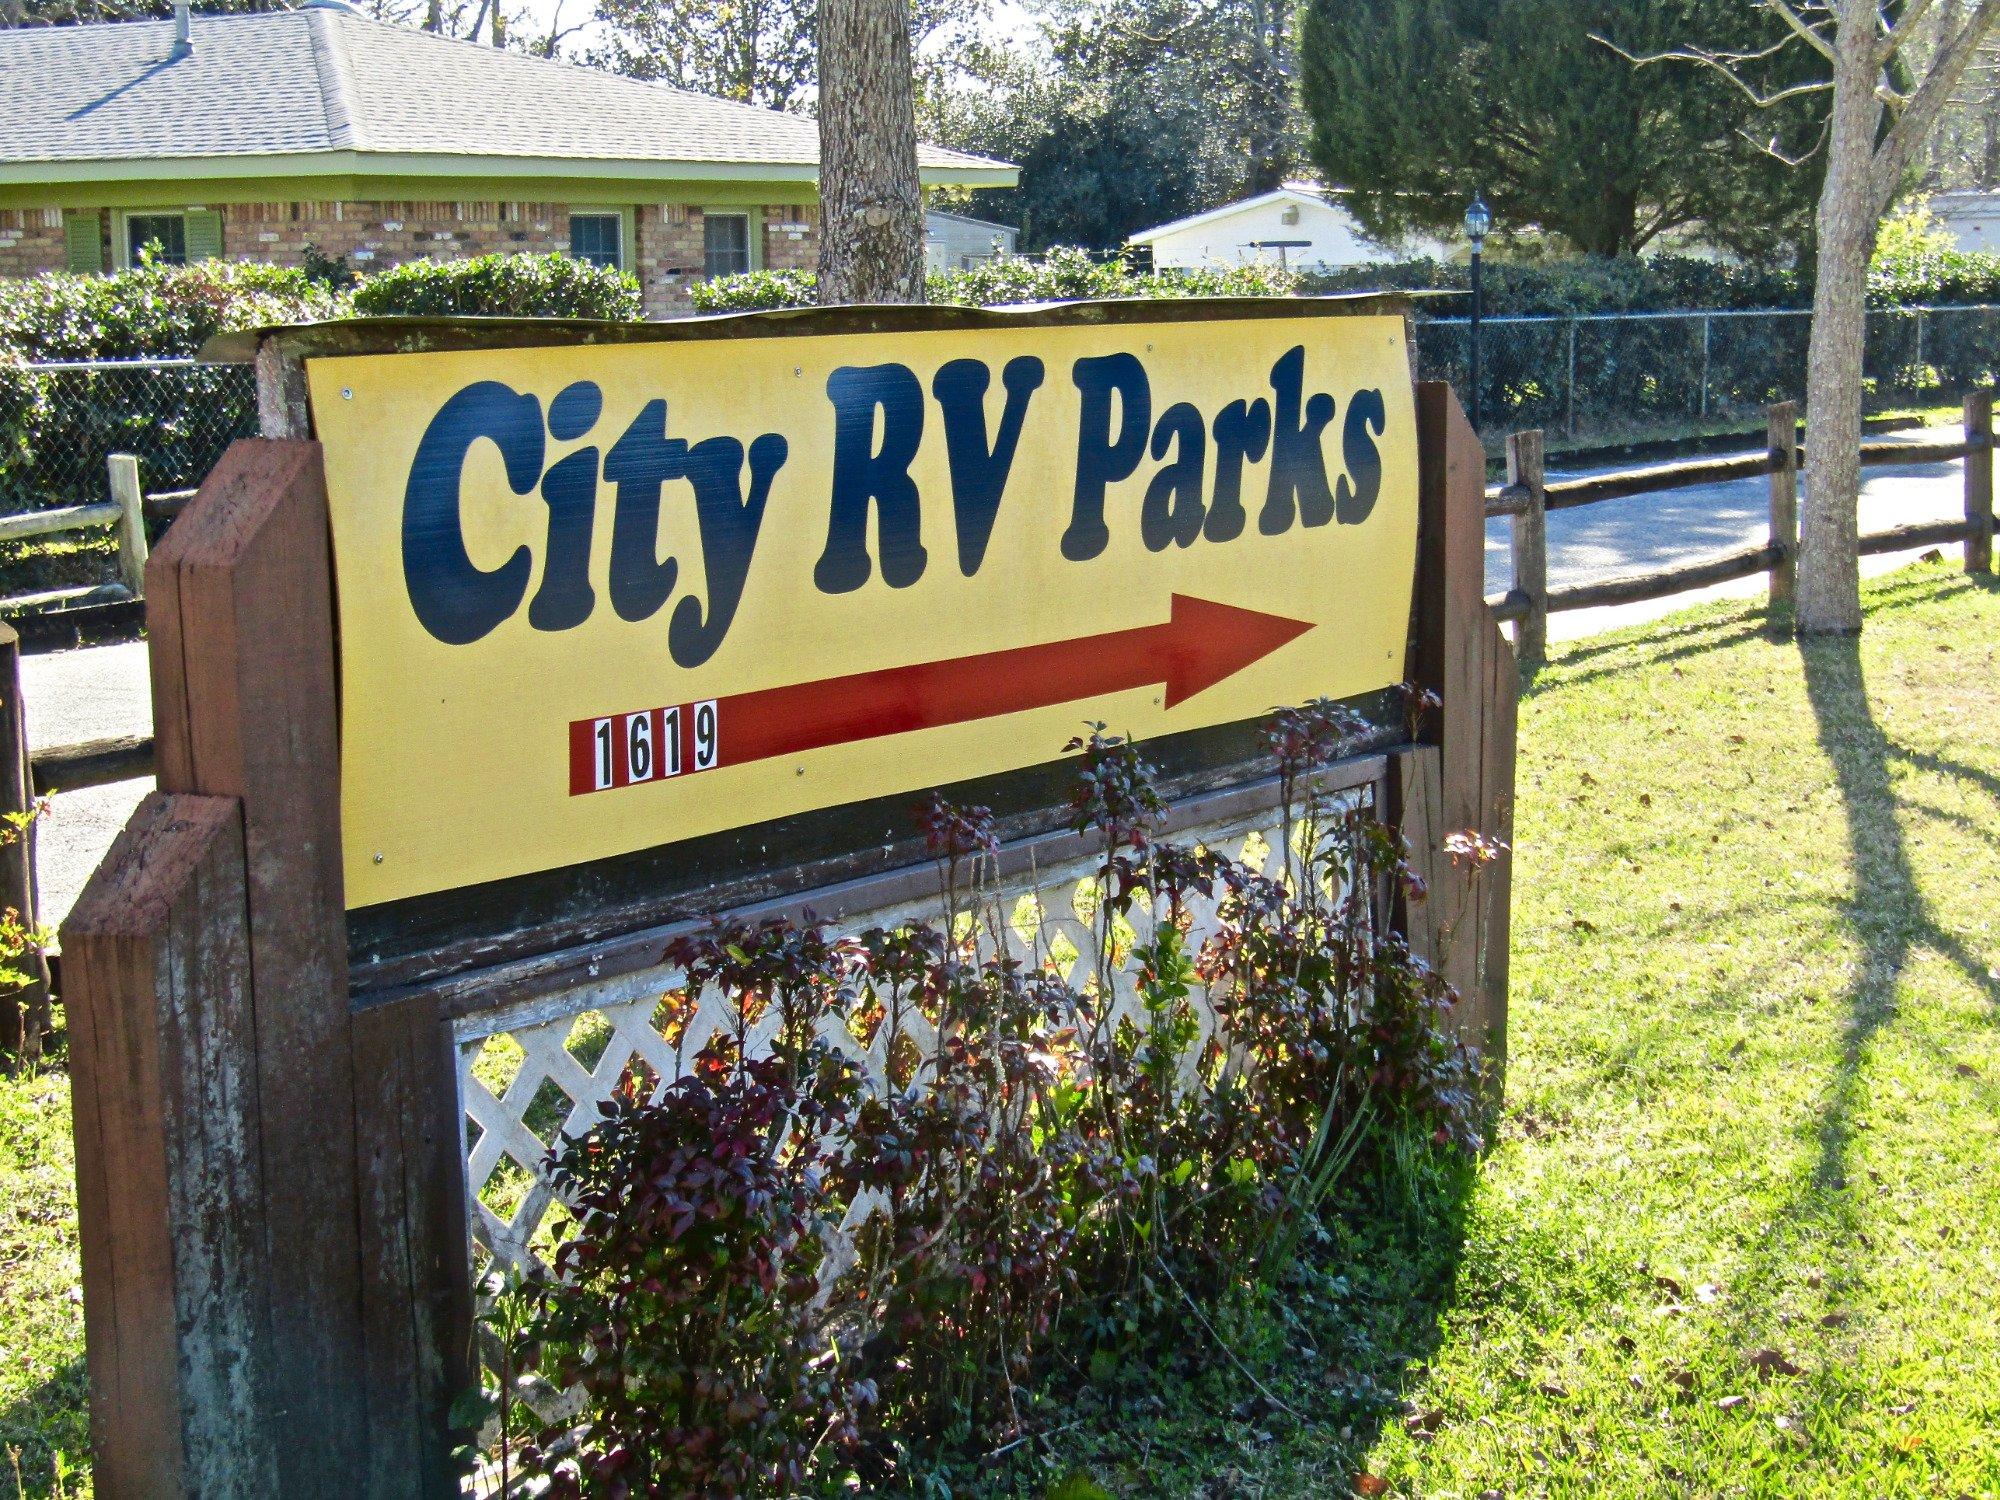 City RV Parks - Mobile